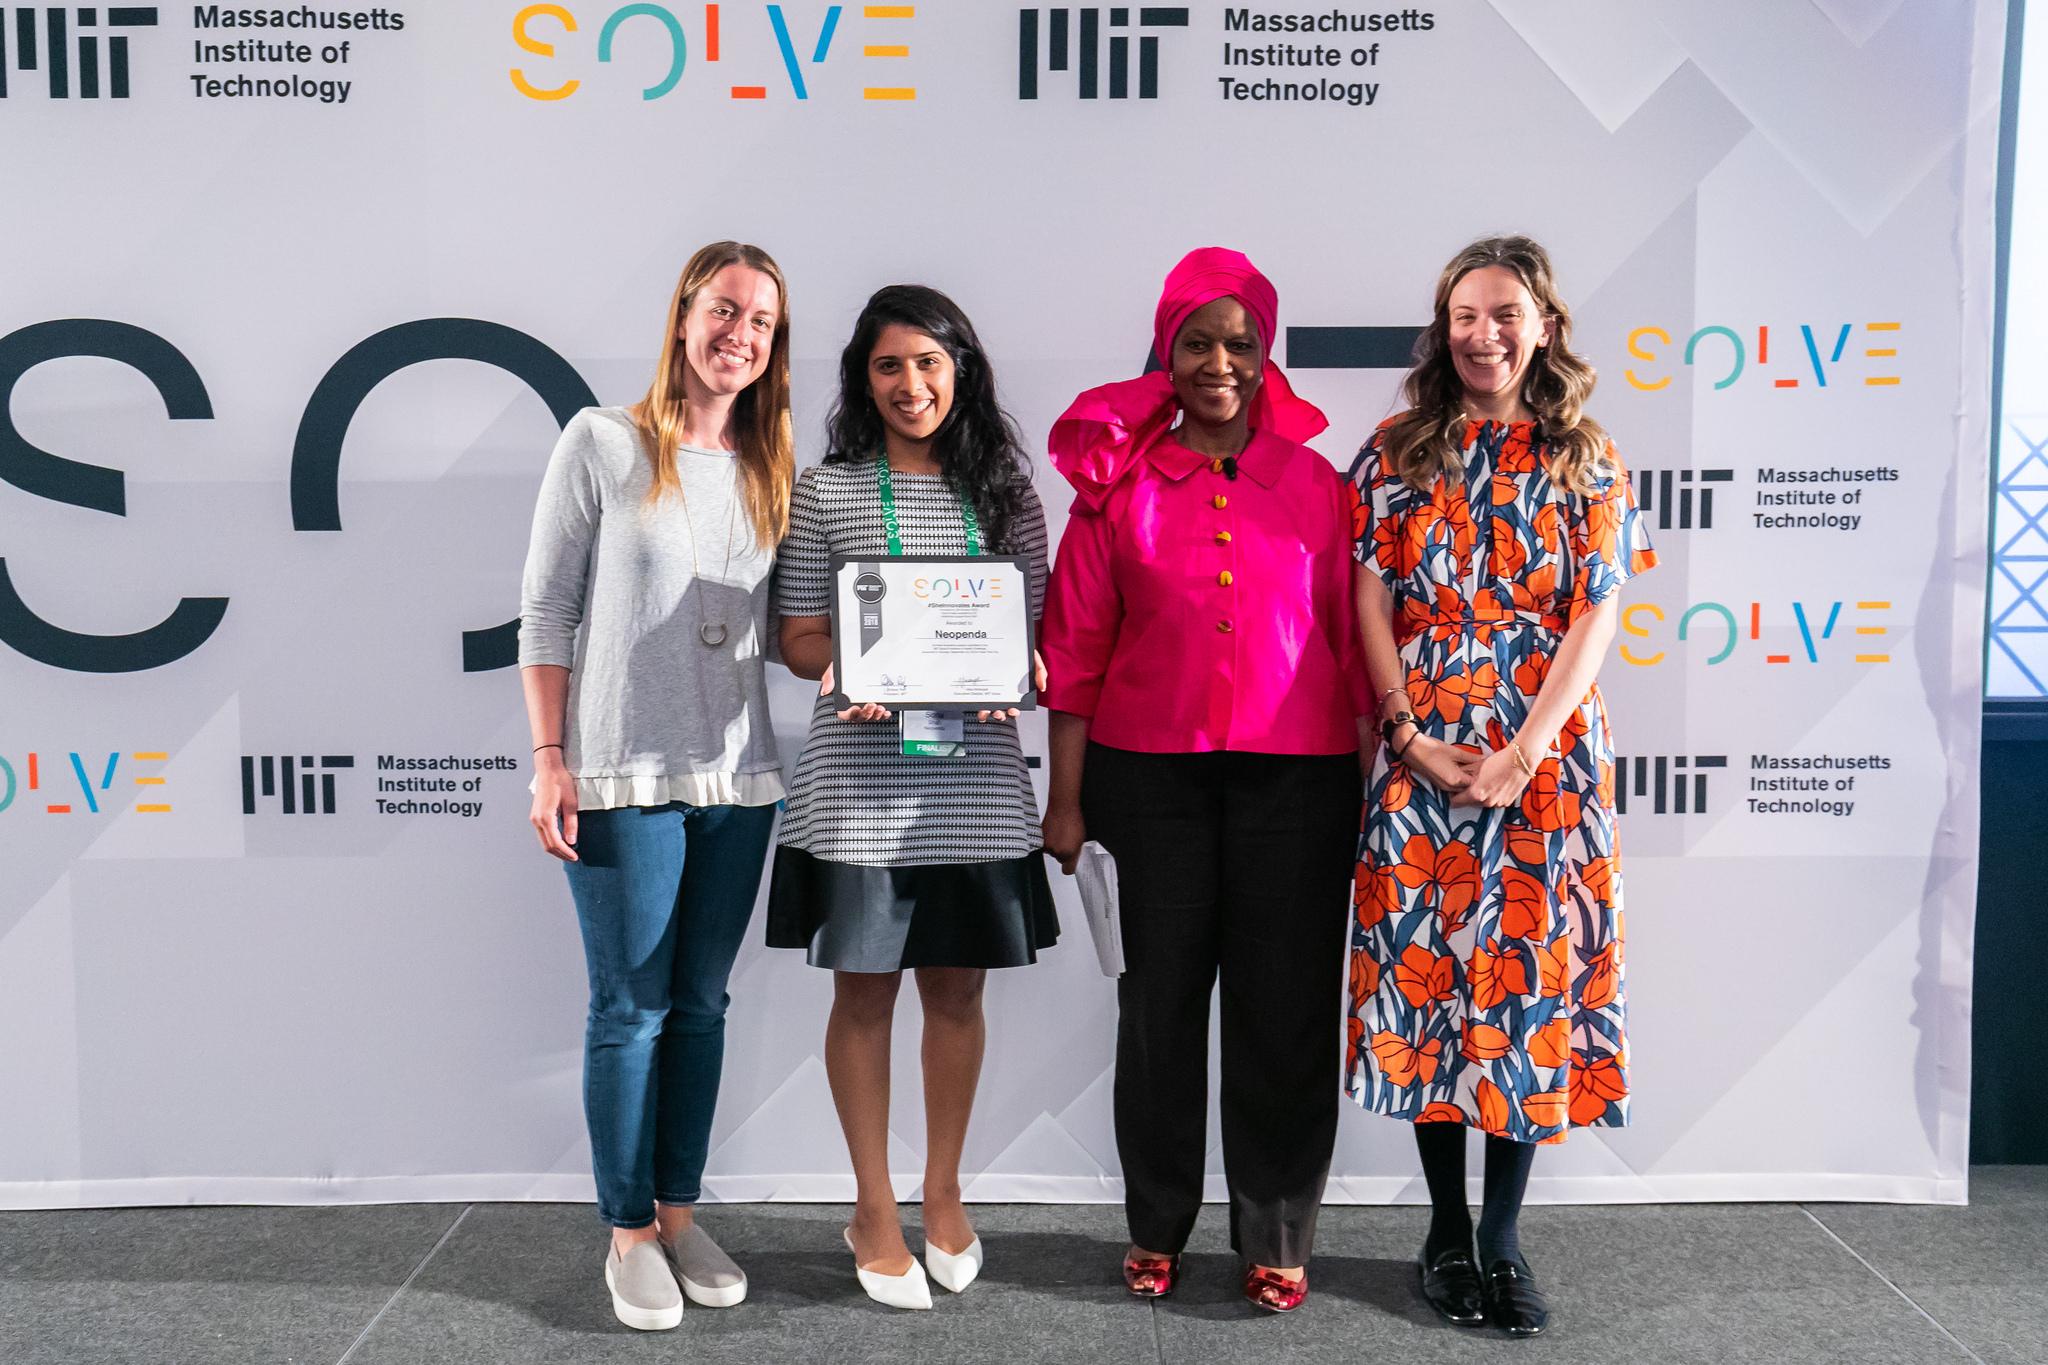 Solve Prize winner Sona Shah